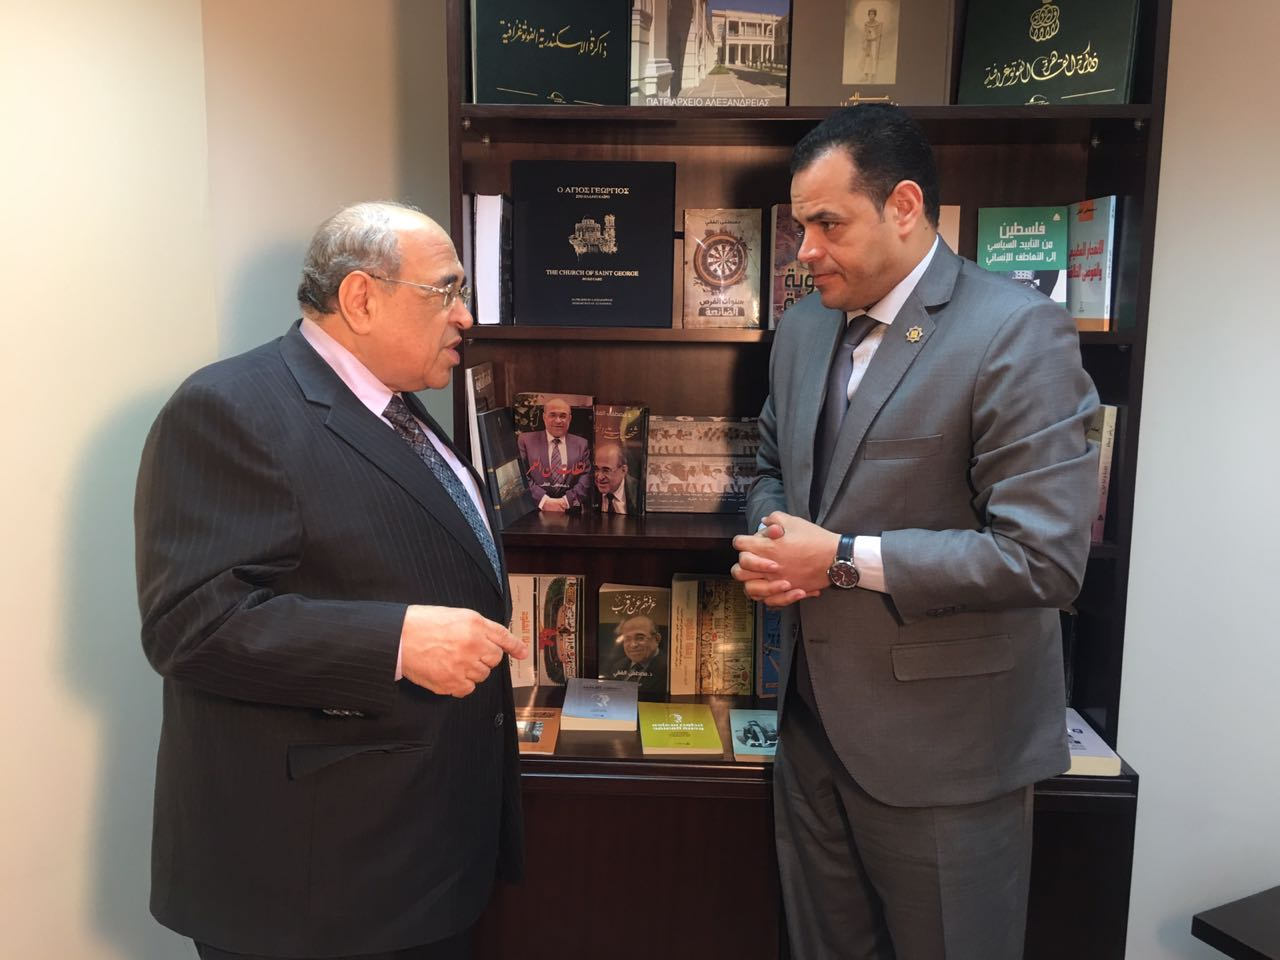 حوار أخبار مصر مع مصطفى الفقى  (3)